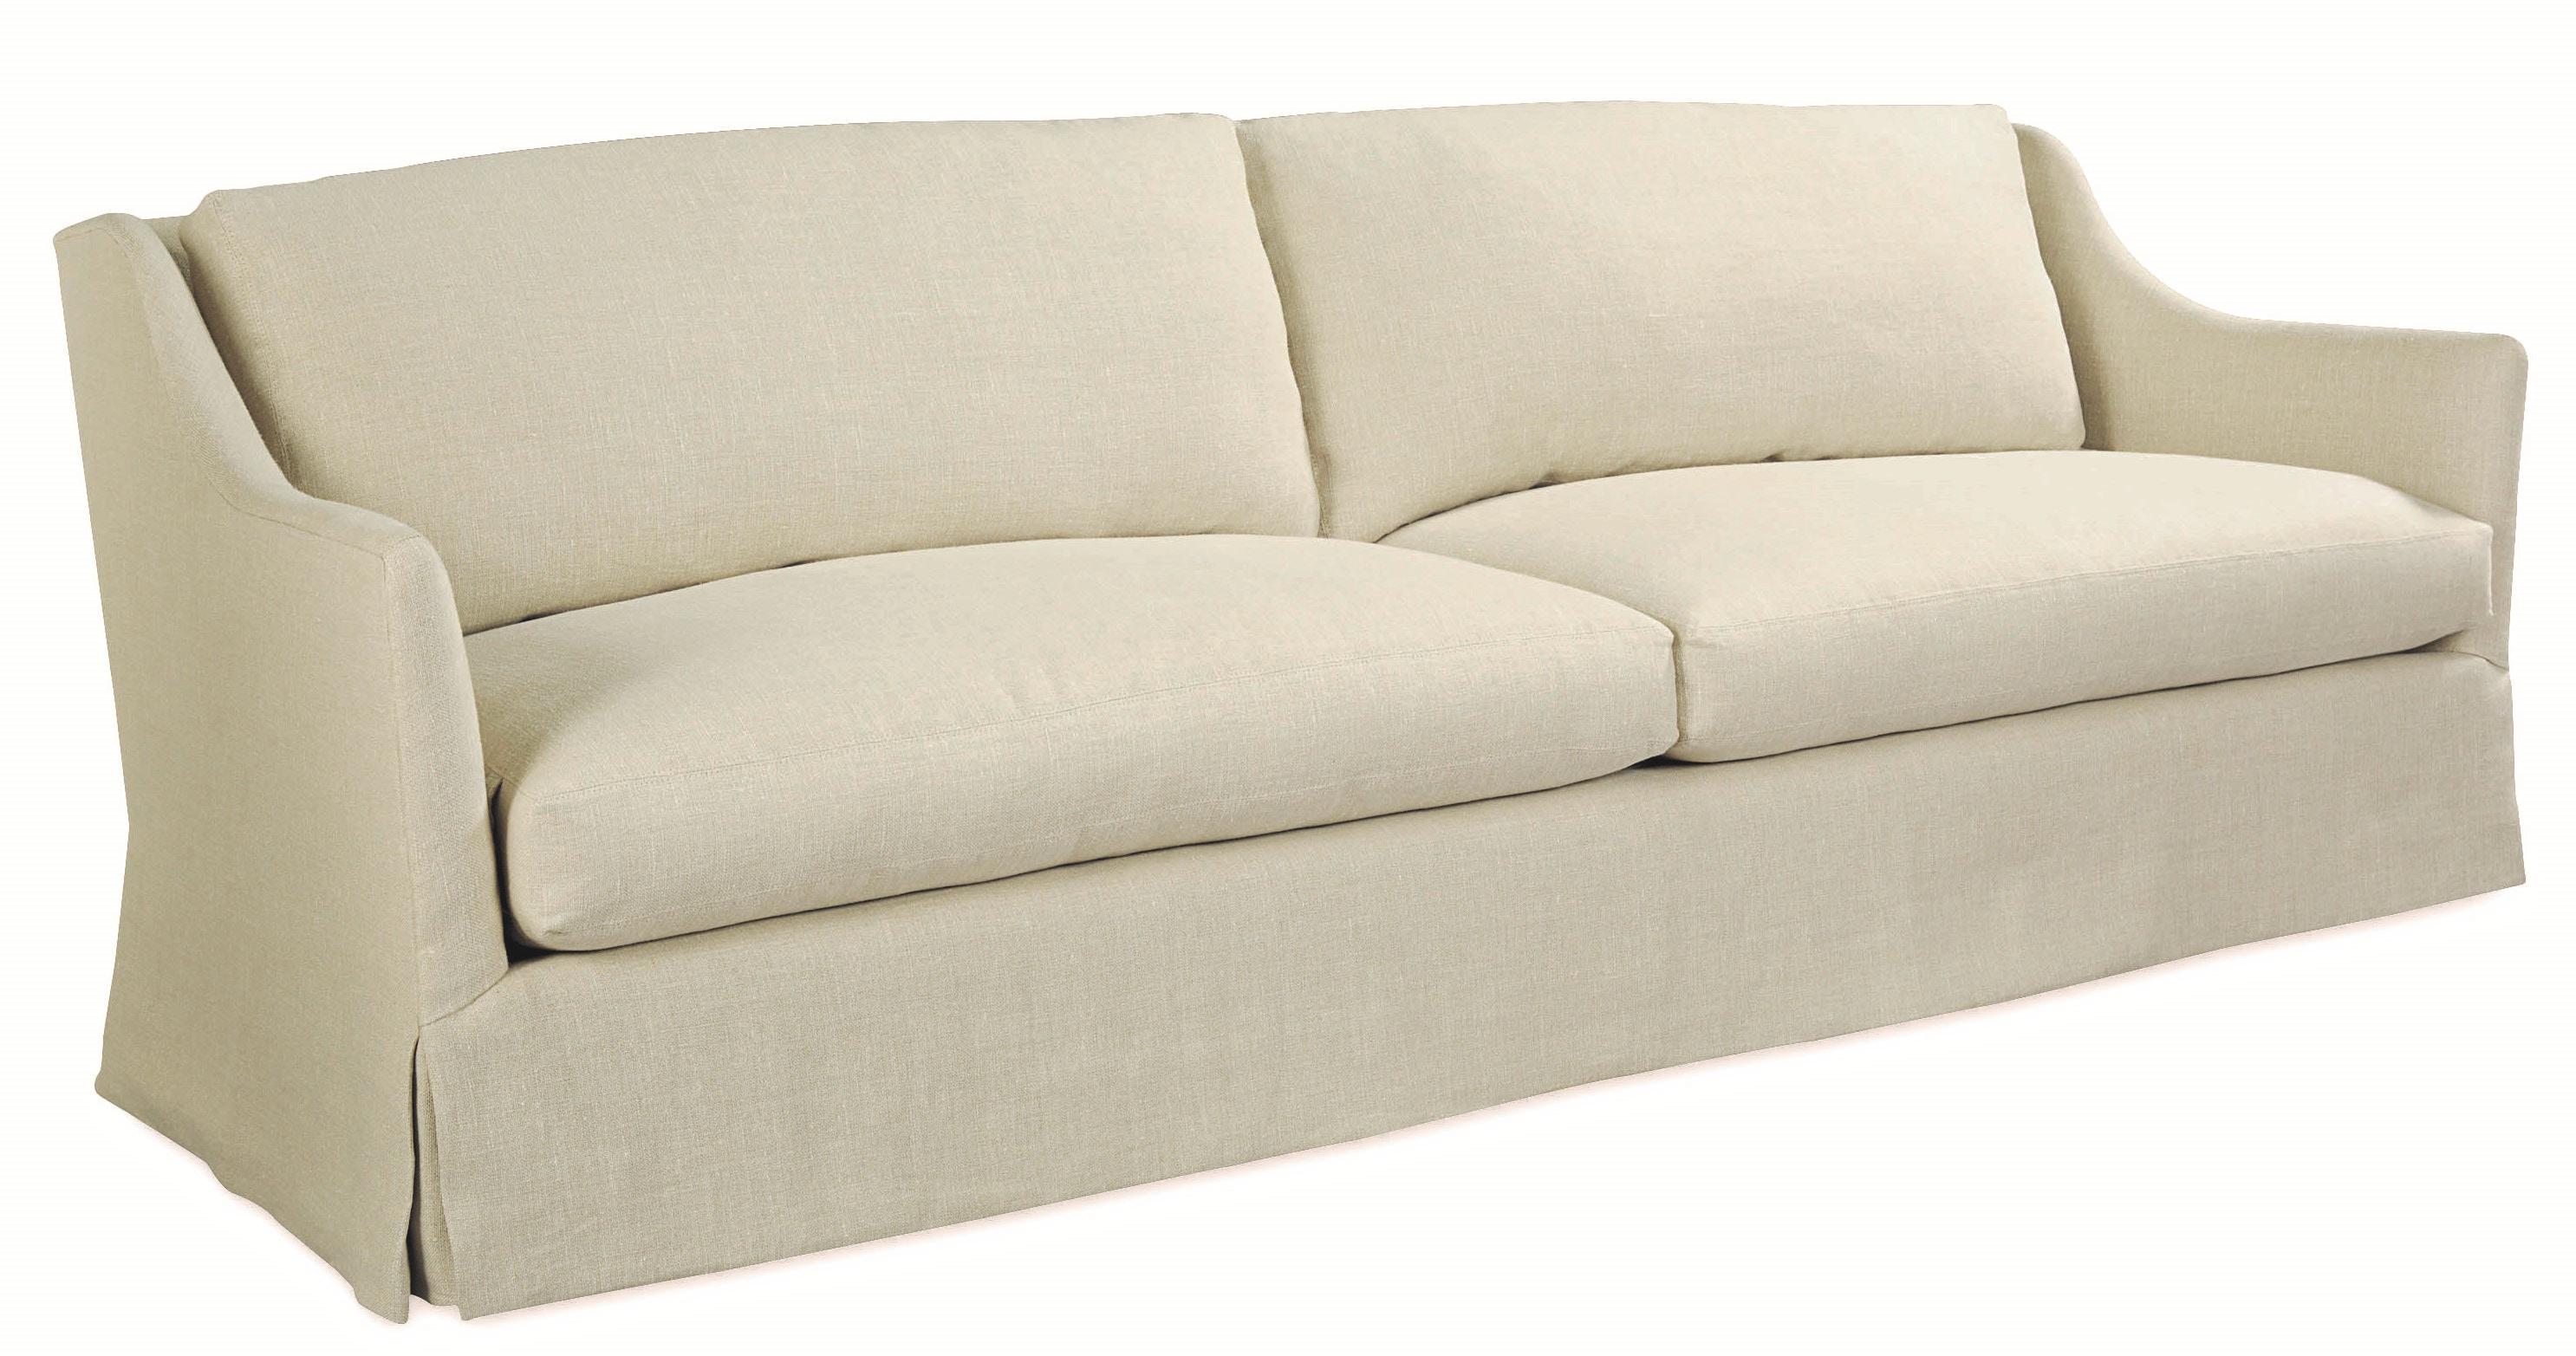 Extra Long Sofa Extra Long Sofa Table Chair Beautiful Extra Long